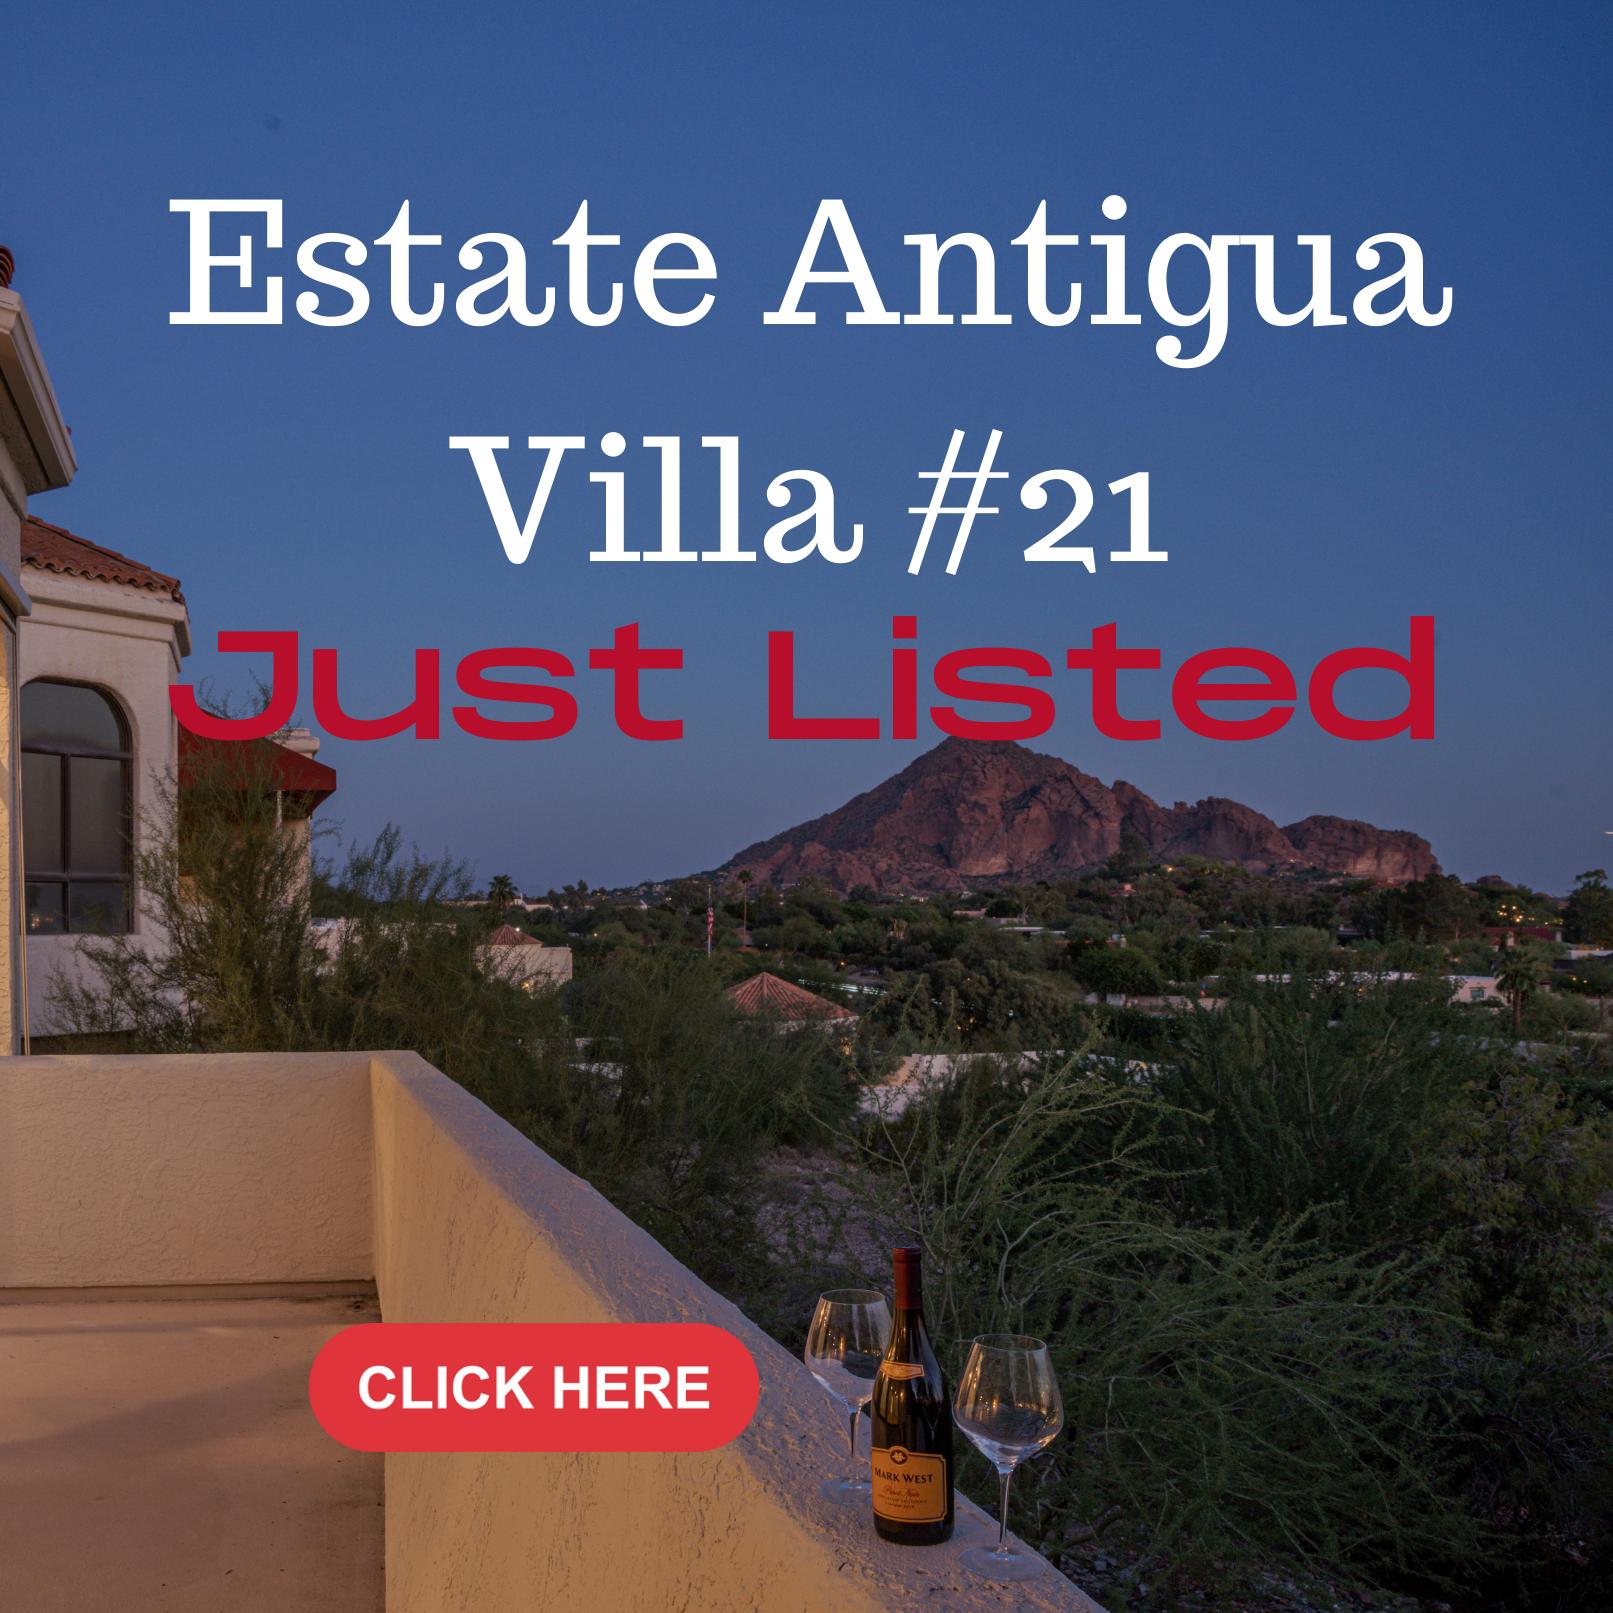 Villa #21 Estate Antigua Just Listed